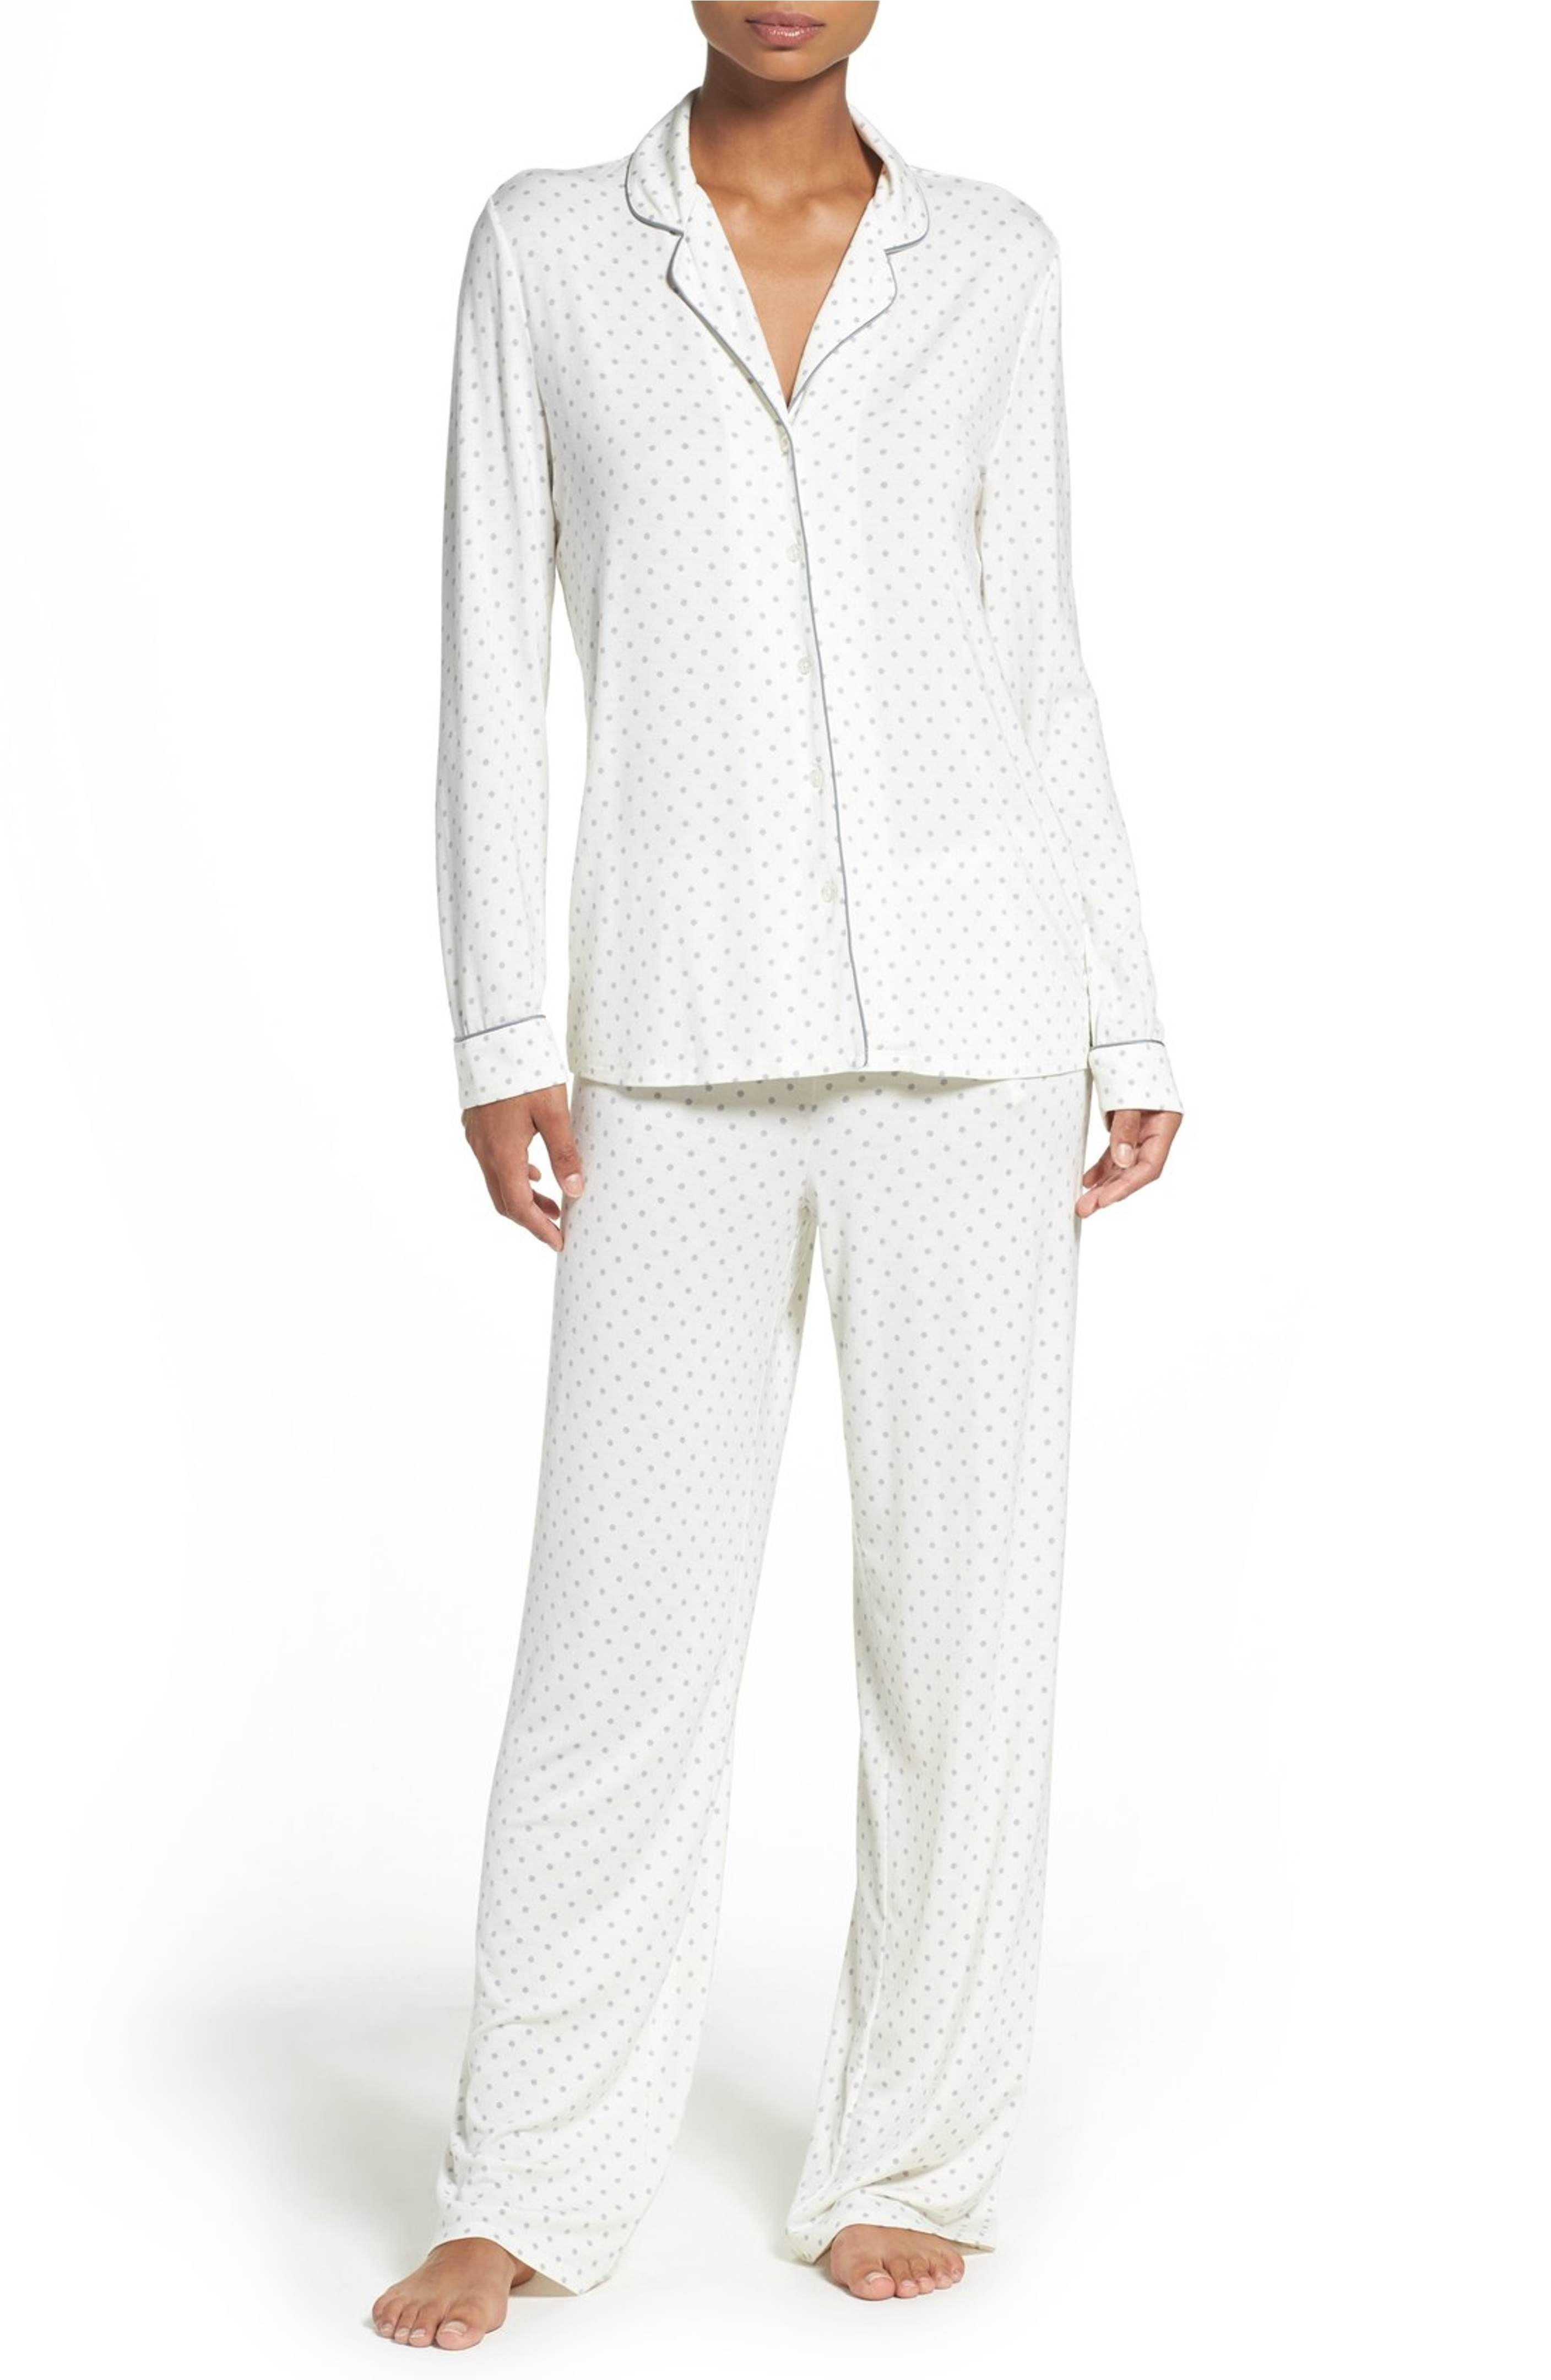 986f556608c Main Image - Nordstrom Lingerie Moonlight Pajamas